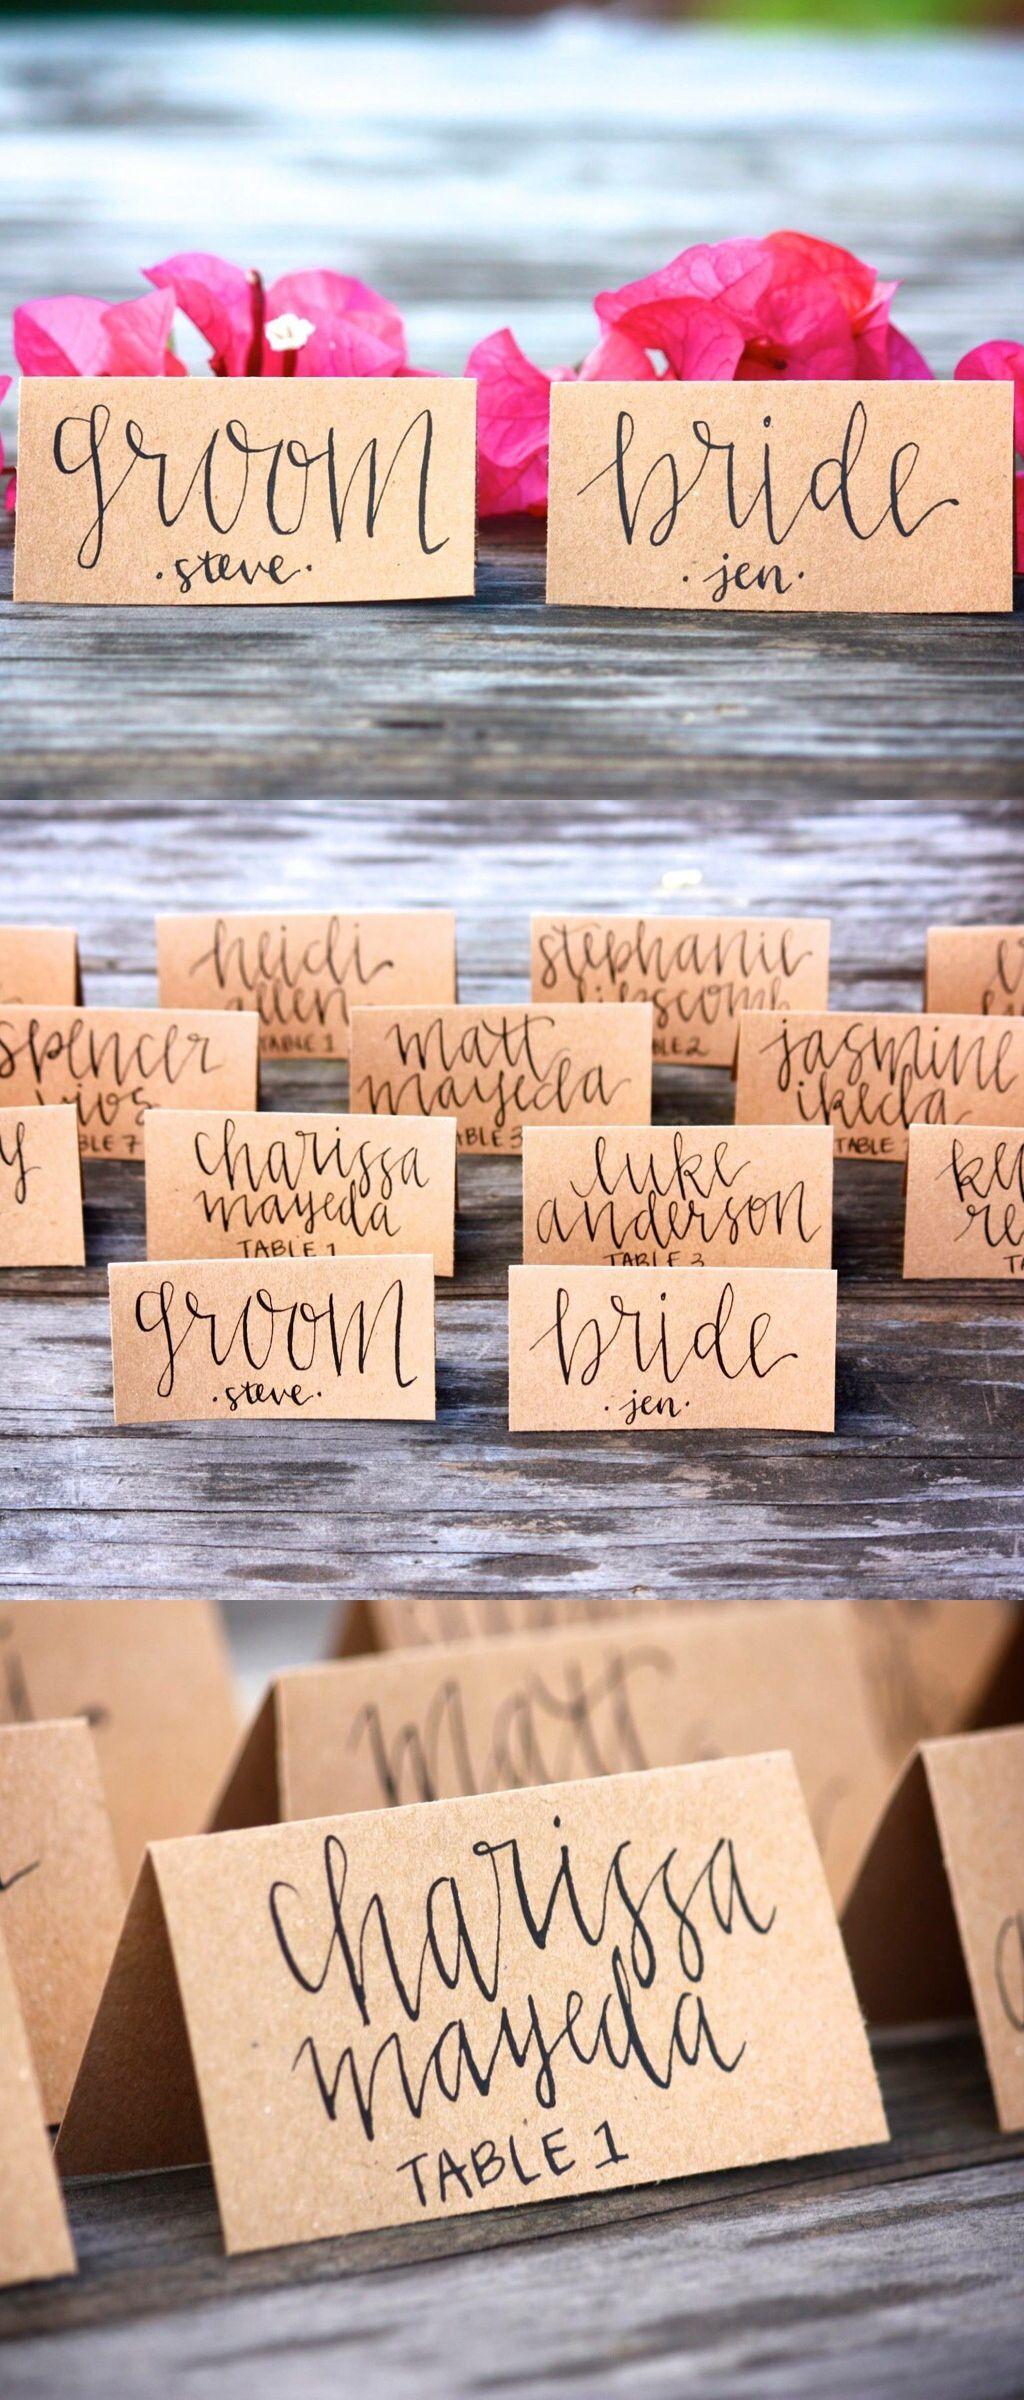 Delightful Dinner Party Name Ideas Part - 1: PLACE CARD WEDDING DECOR IDEAS || Wedding Place Cards - Tent Fold - Escort  Card